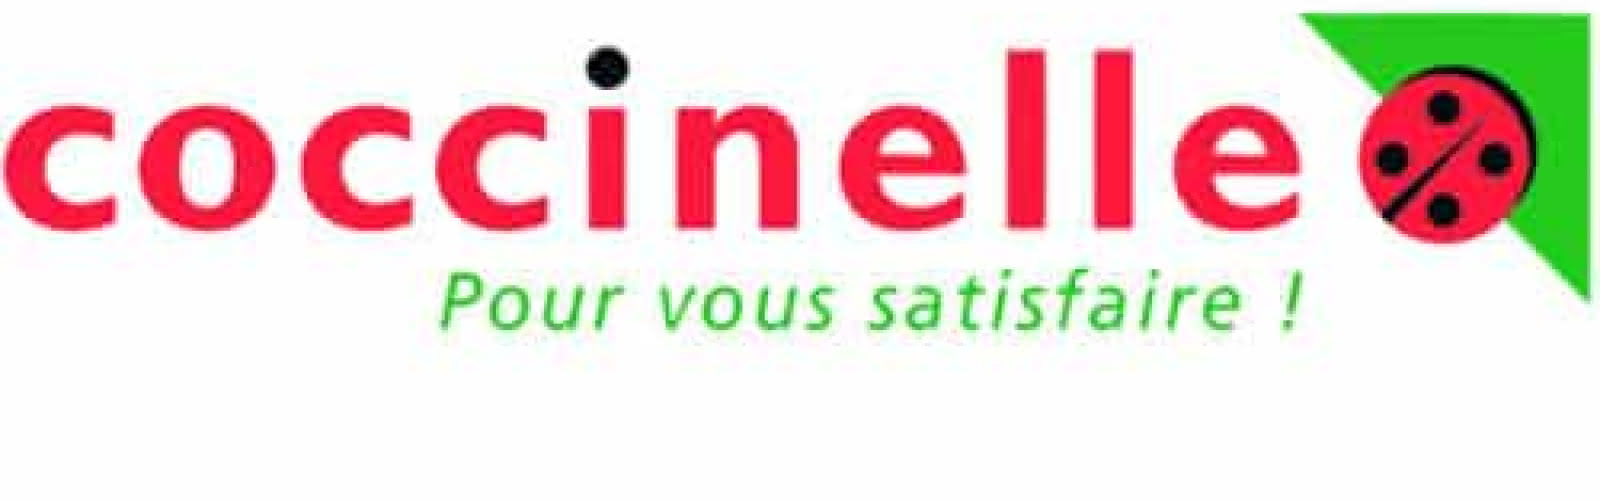 logo Coccinelle - Superette